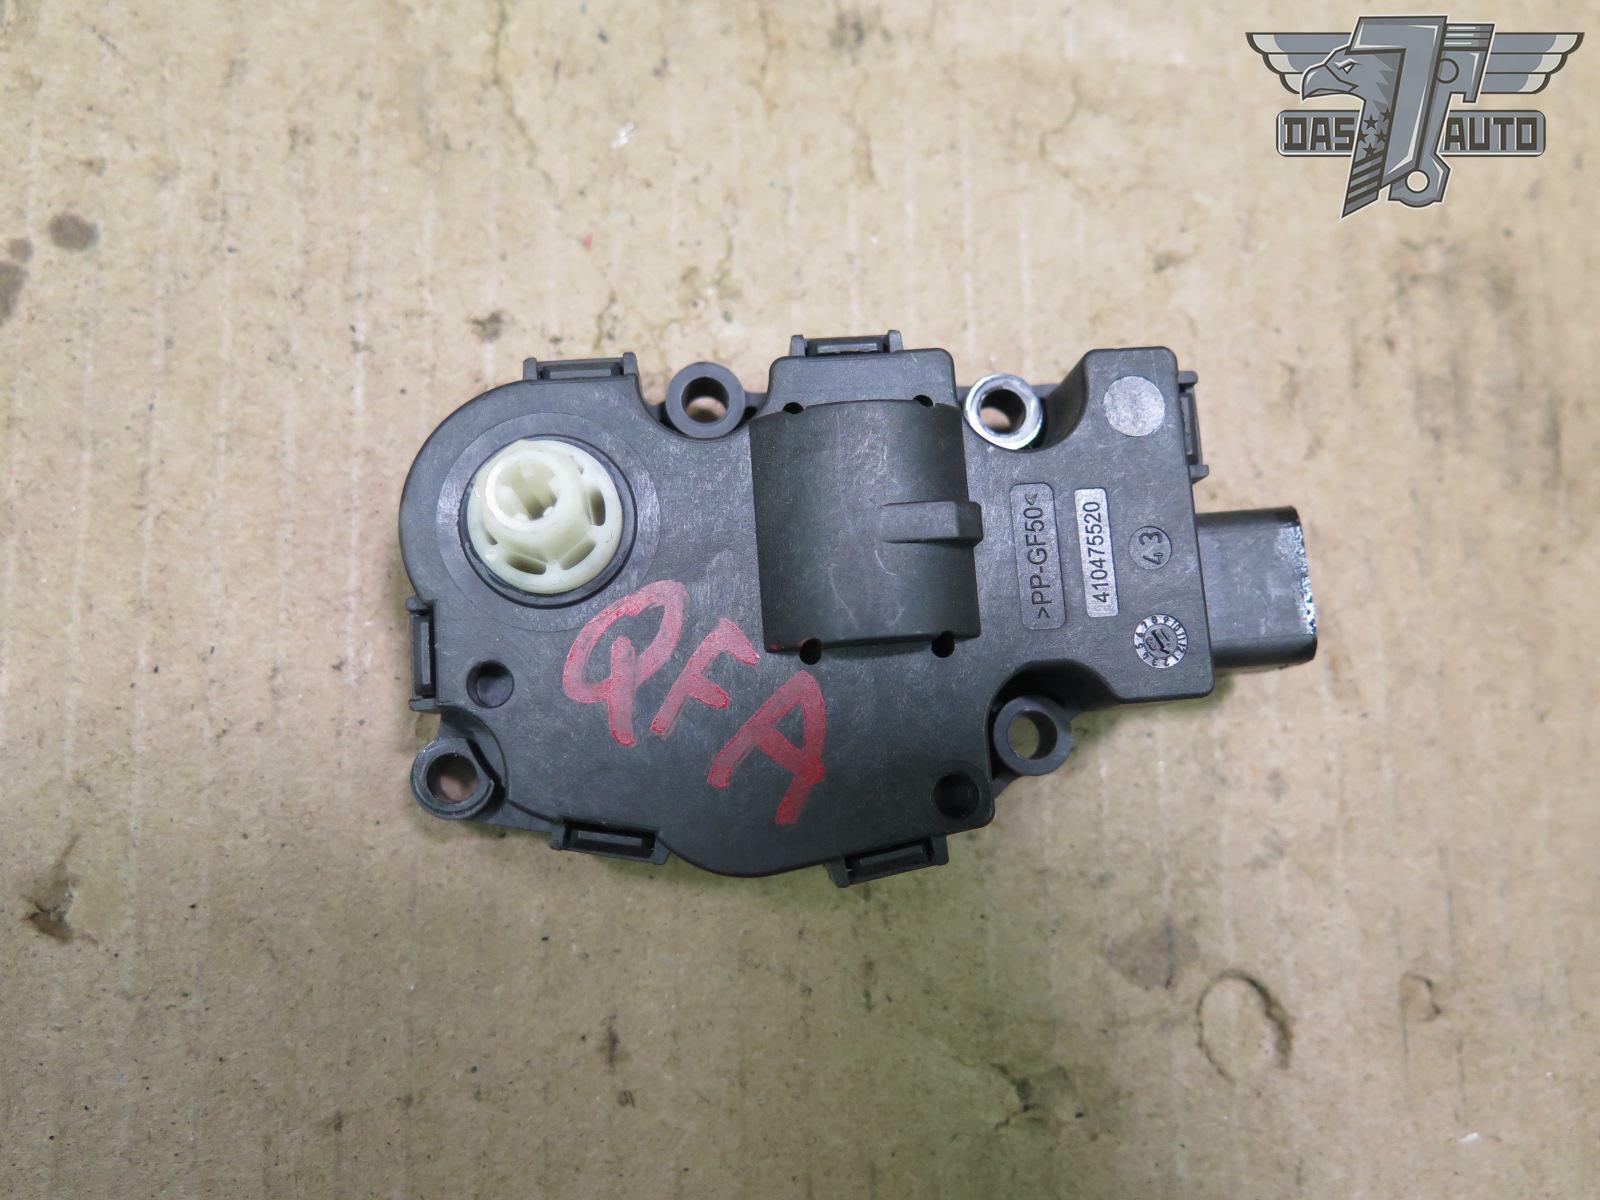 11-16 AUDI A5 A//C Heater Blower Motor Door Blend Flap Motor Per 1 OEM Used